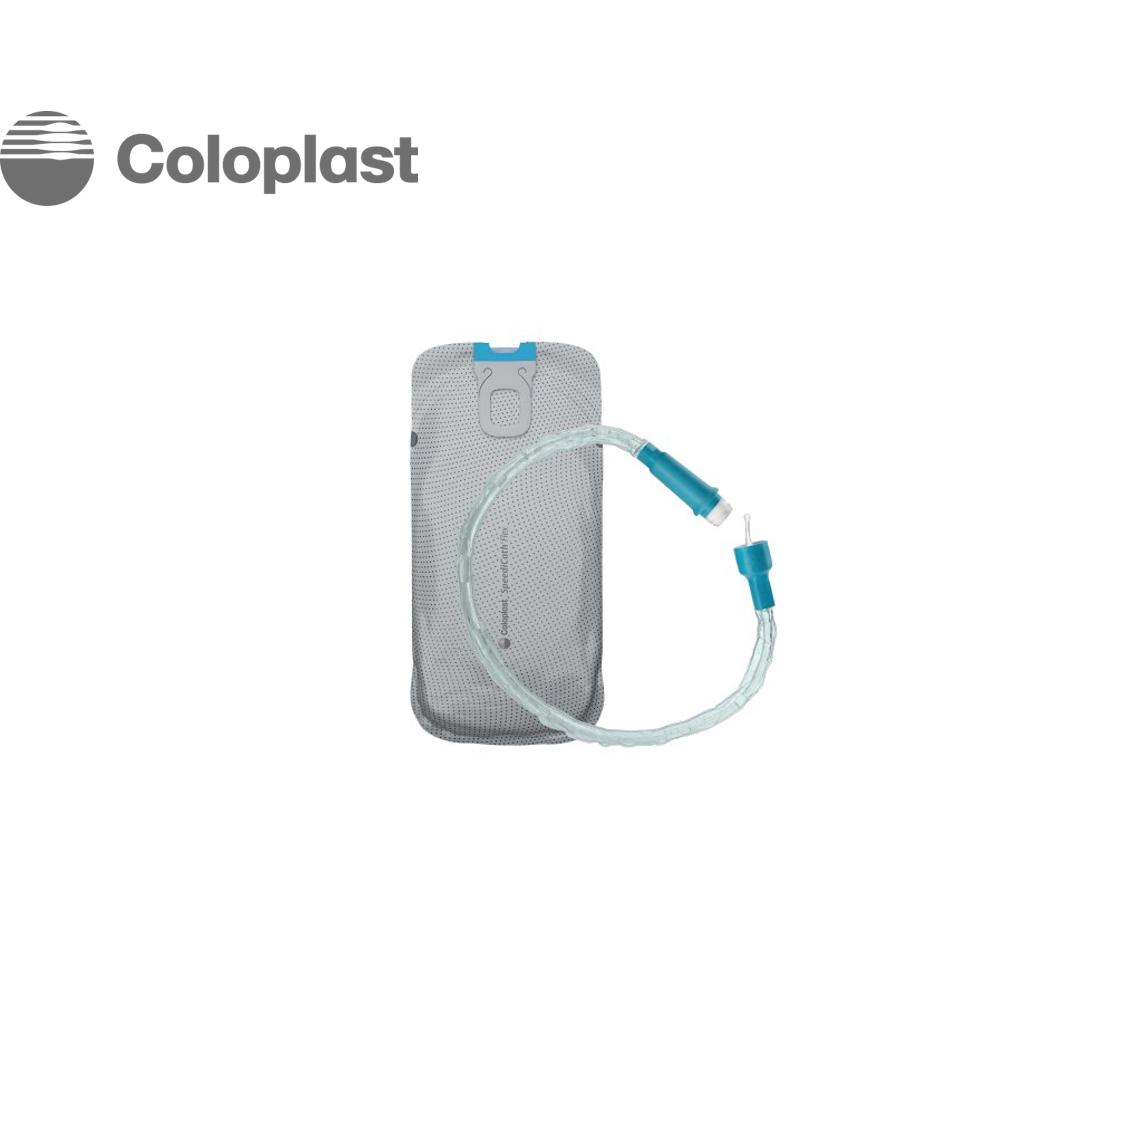 Urethral Catheter SpeediCath® Flex Coudé Pro Coude Tip Hydrophilic Coated Polyurethane